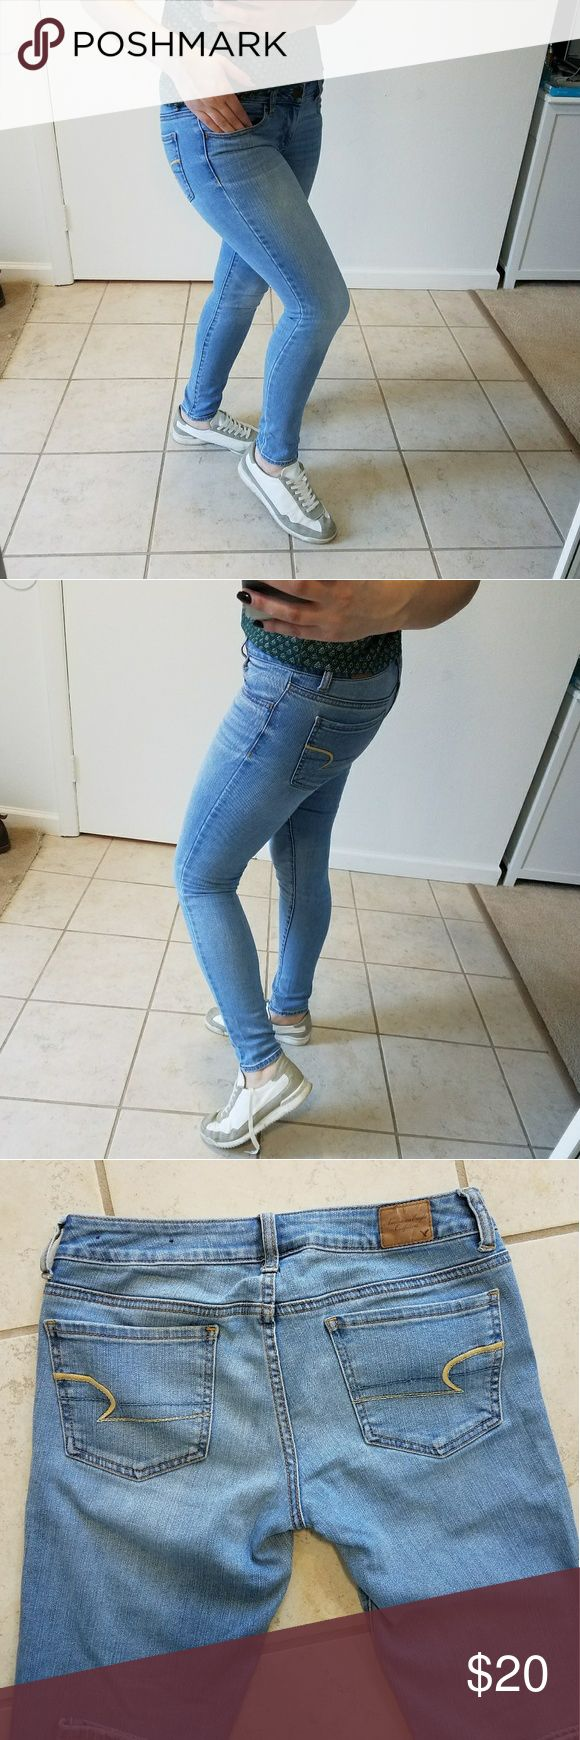 17 Best ideas about Light Blue Jeans on Pinterest   Light blue jeans outfit Skinny jeans ...